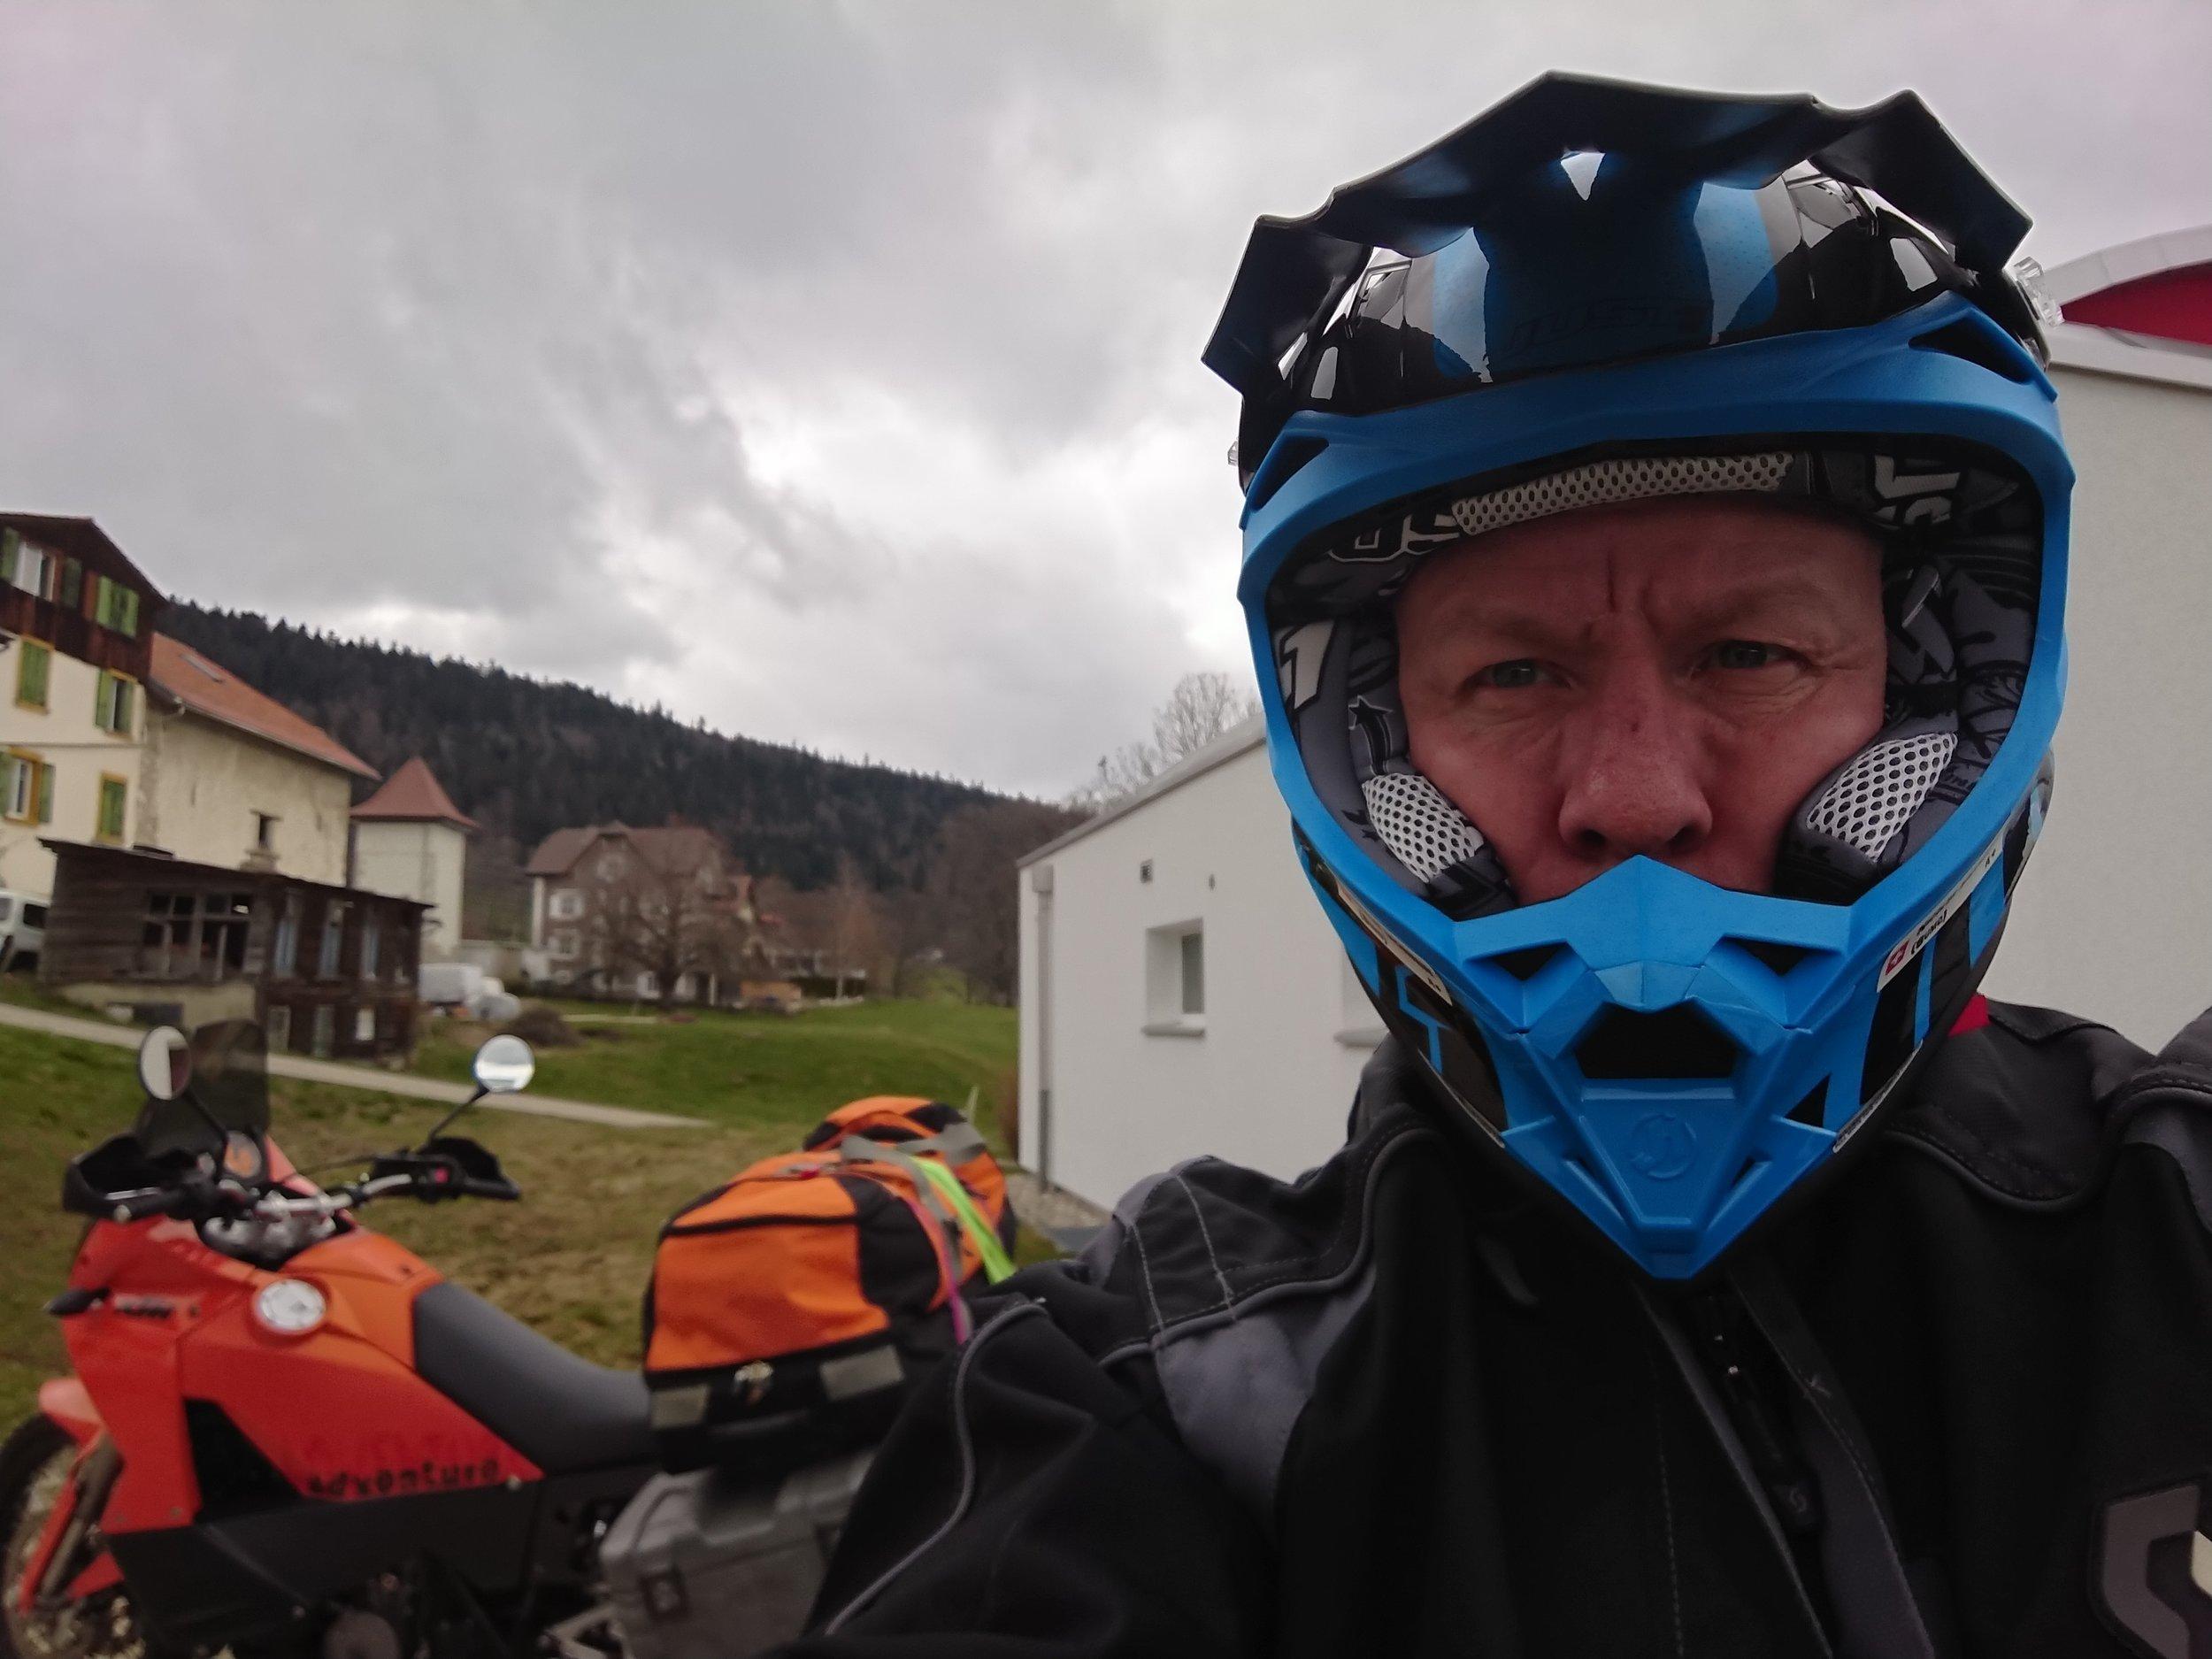 - Un peu de moto jusqu'à Genève aéroport … Cool !